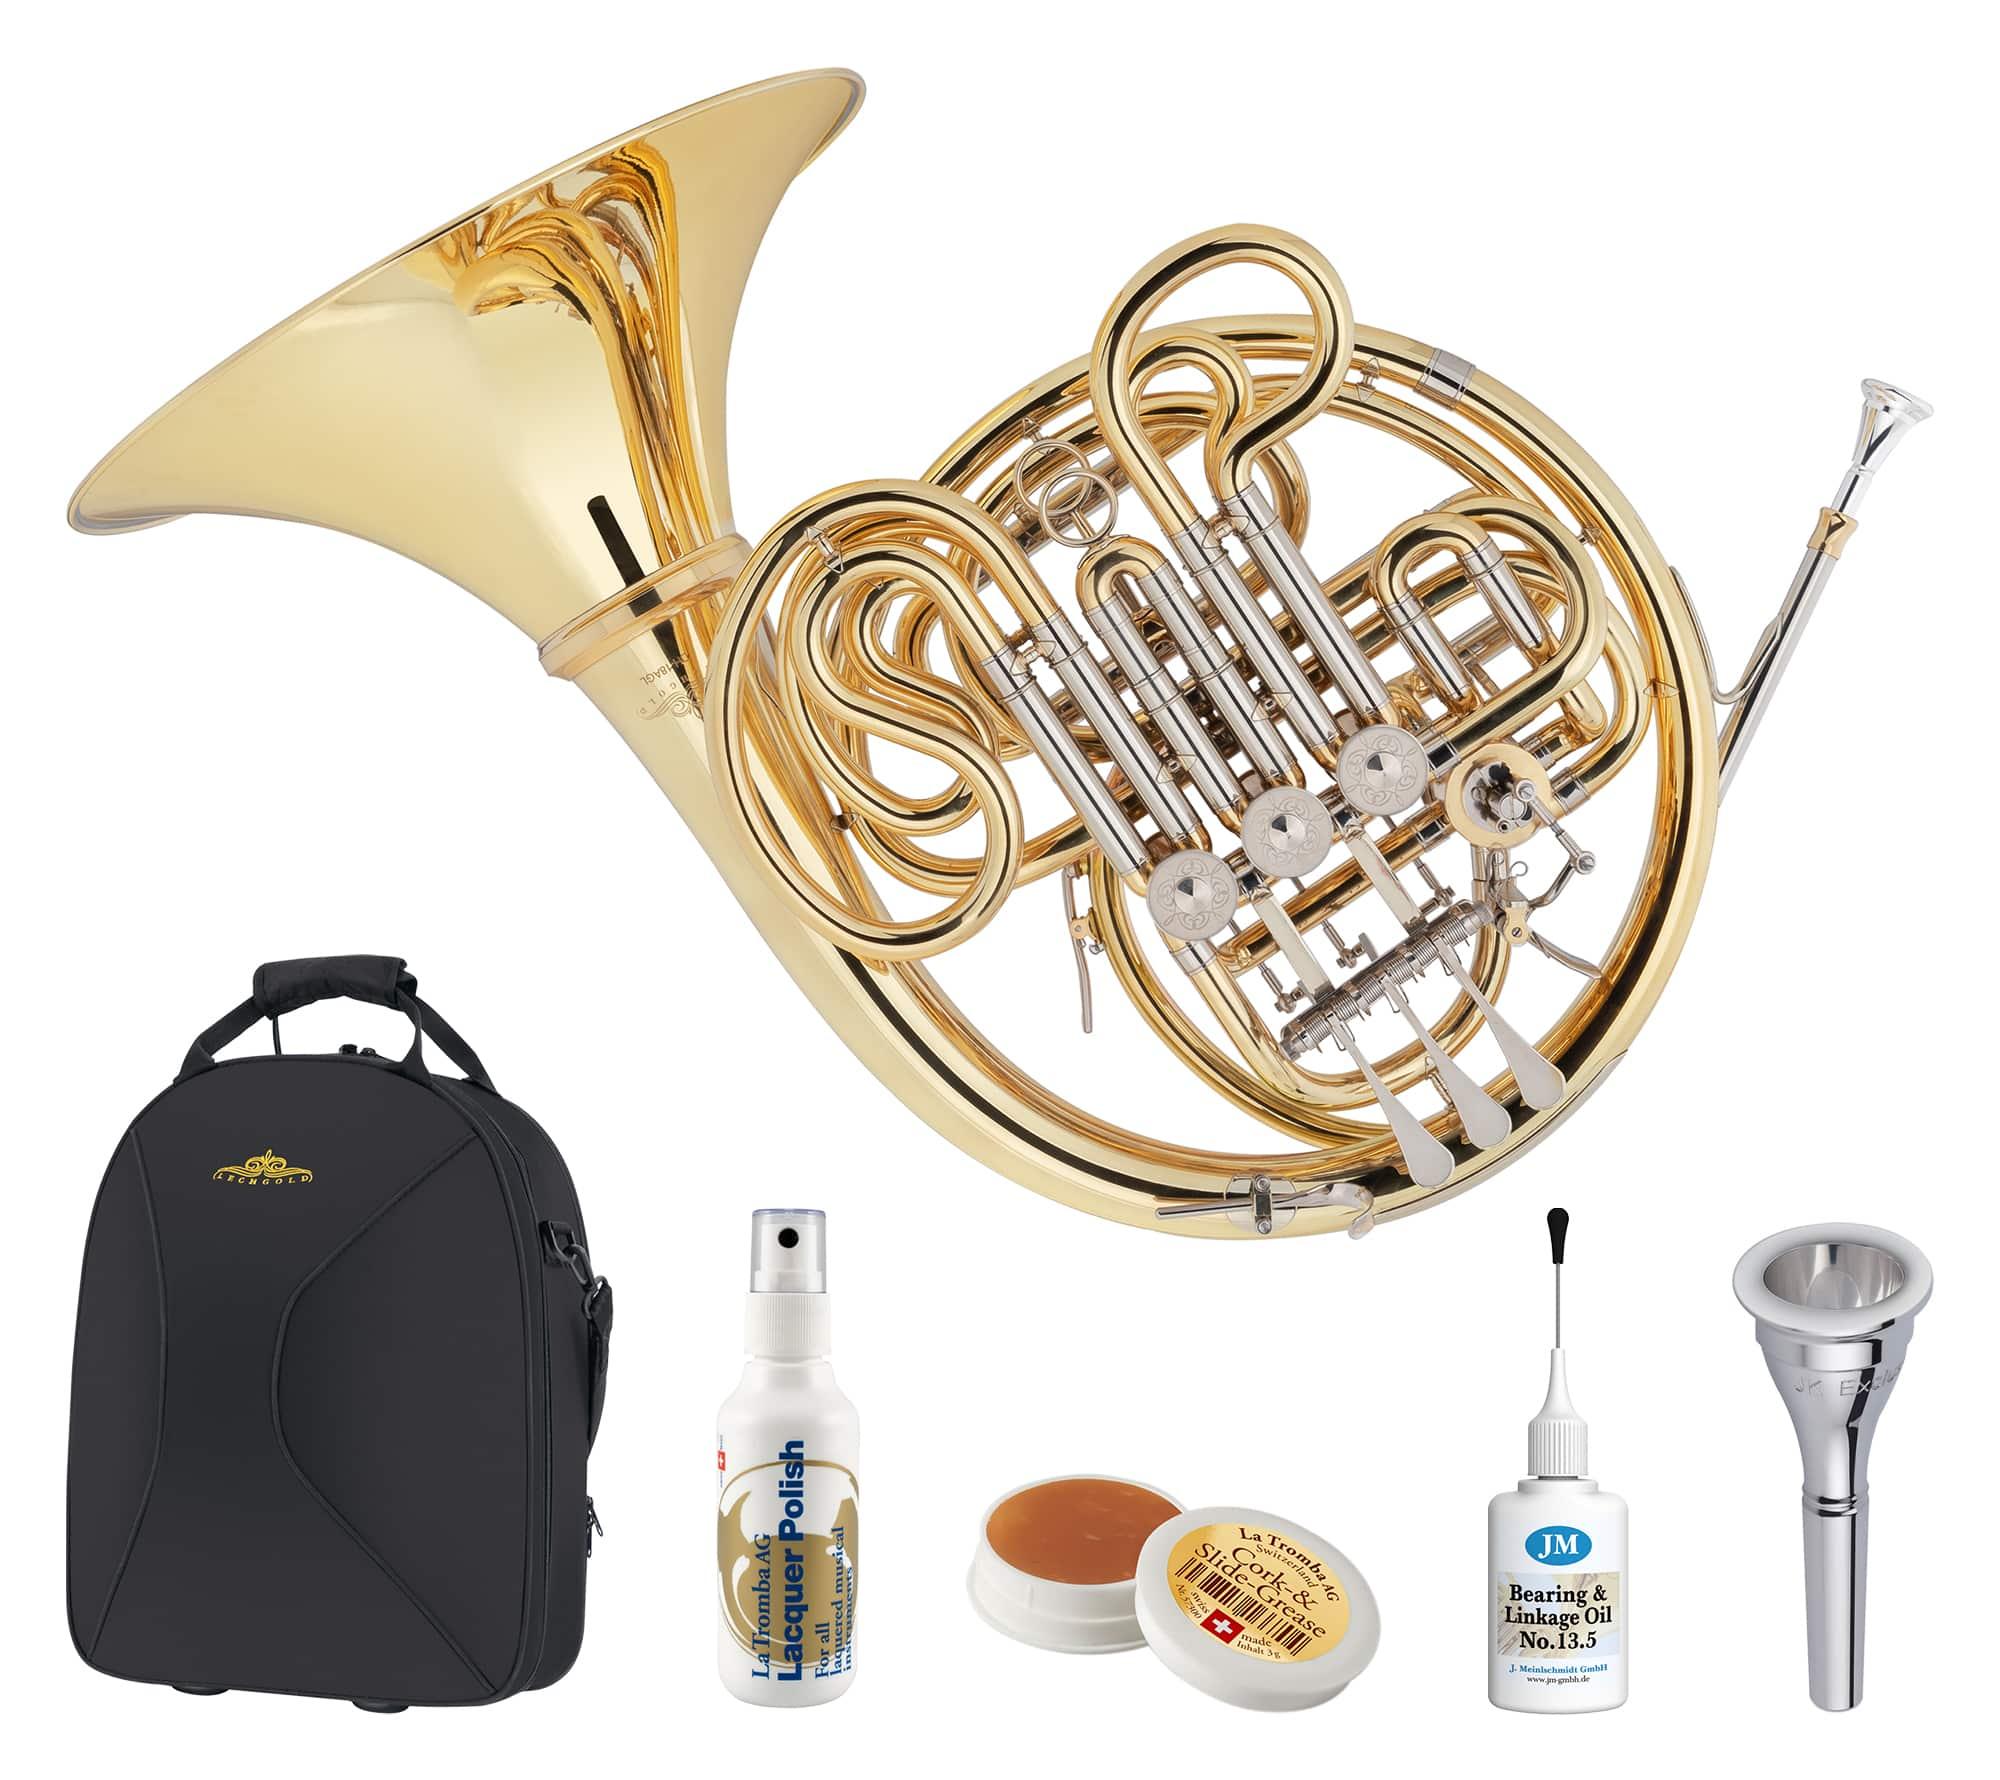 Hoerner - Lechgold DH 18AGL Doppelhorn Deluxe Set - Onlineshop Musikhaus Kirstein